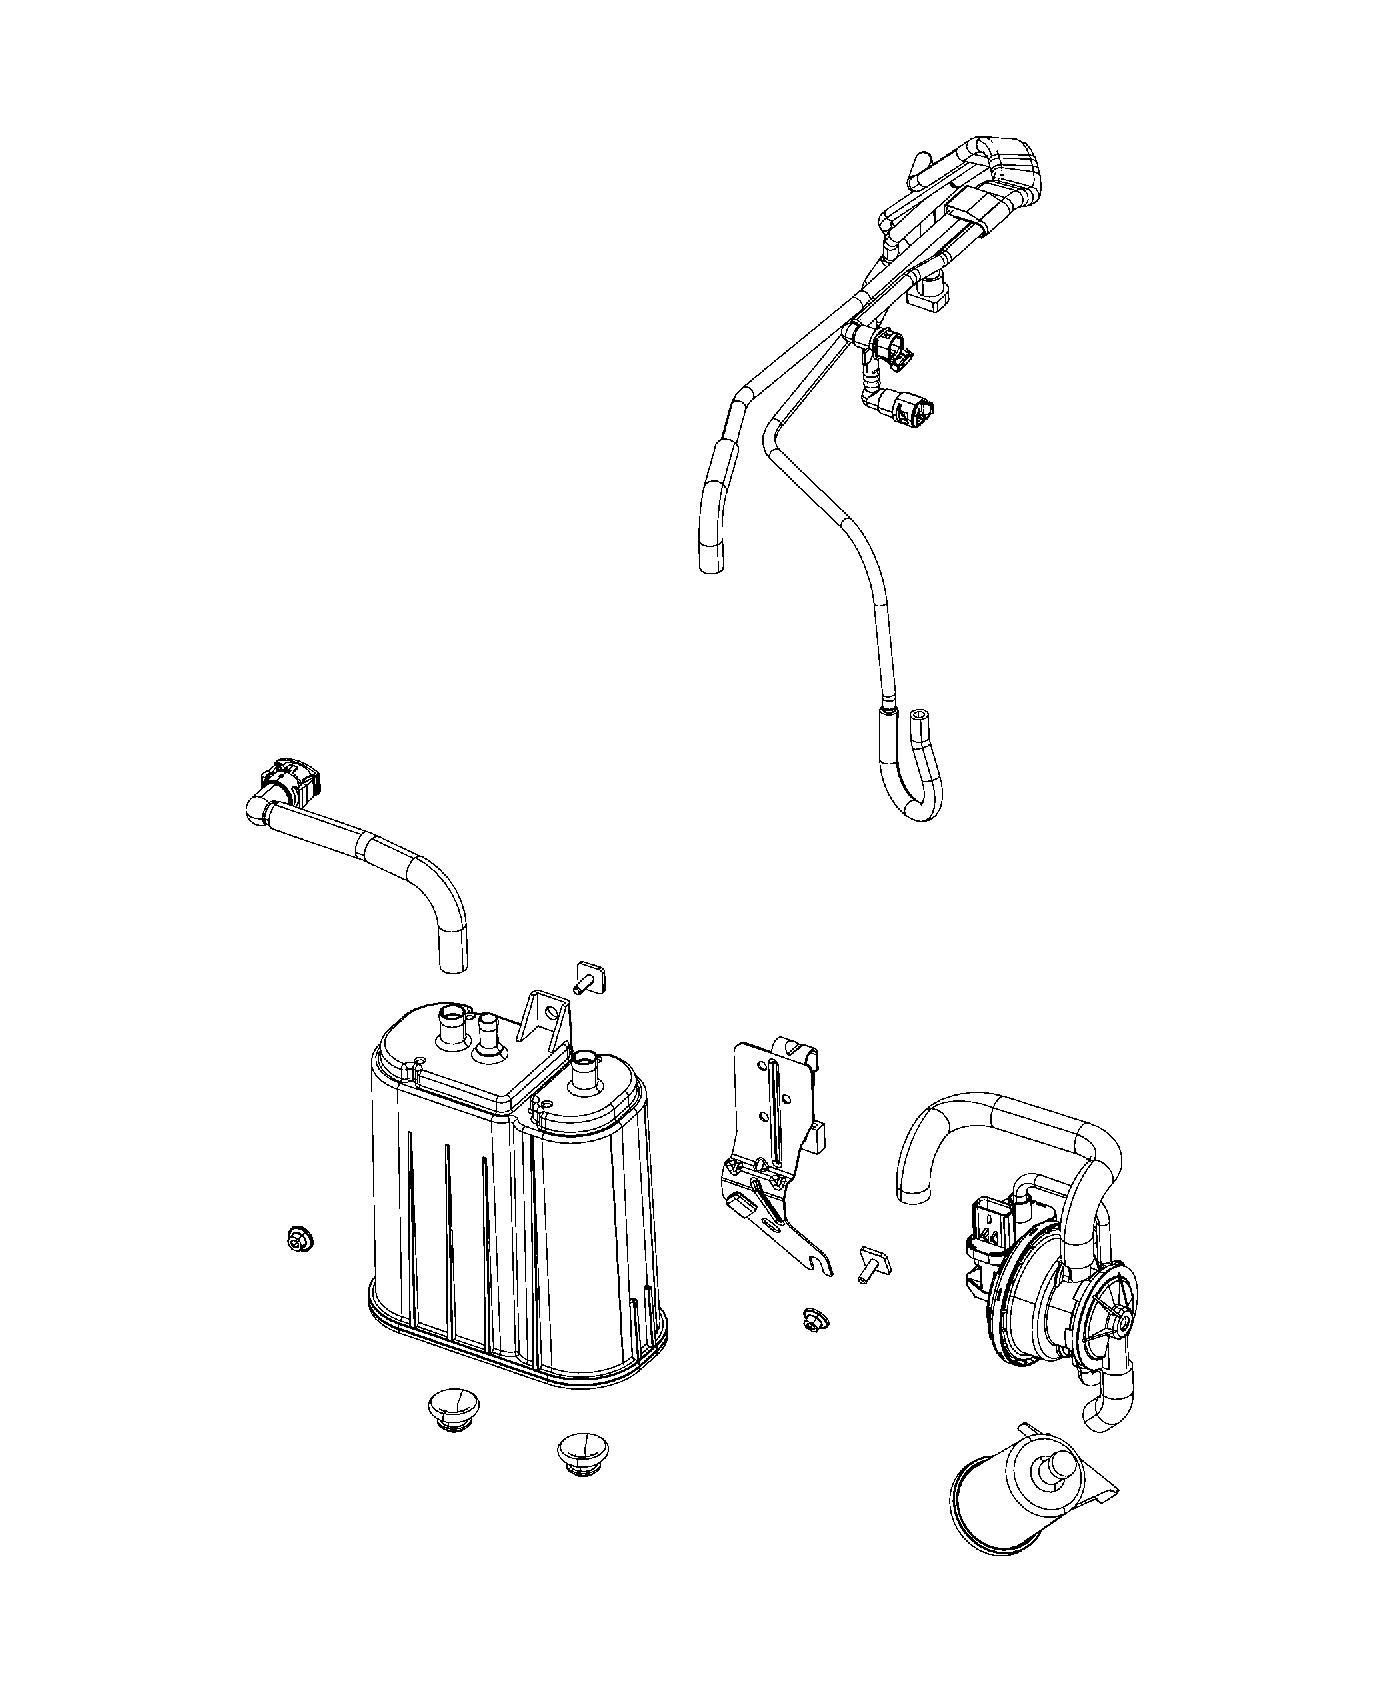 Dodge Viper Filter Fuel Vapor Vent Leak Detection